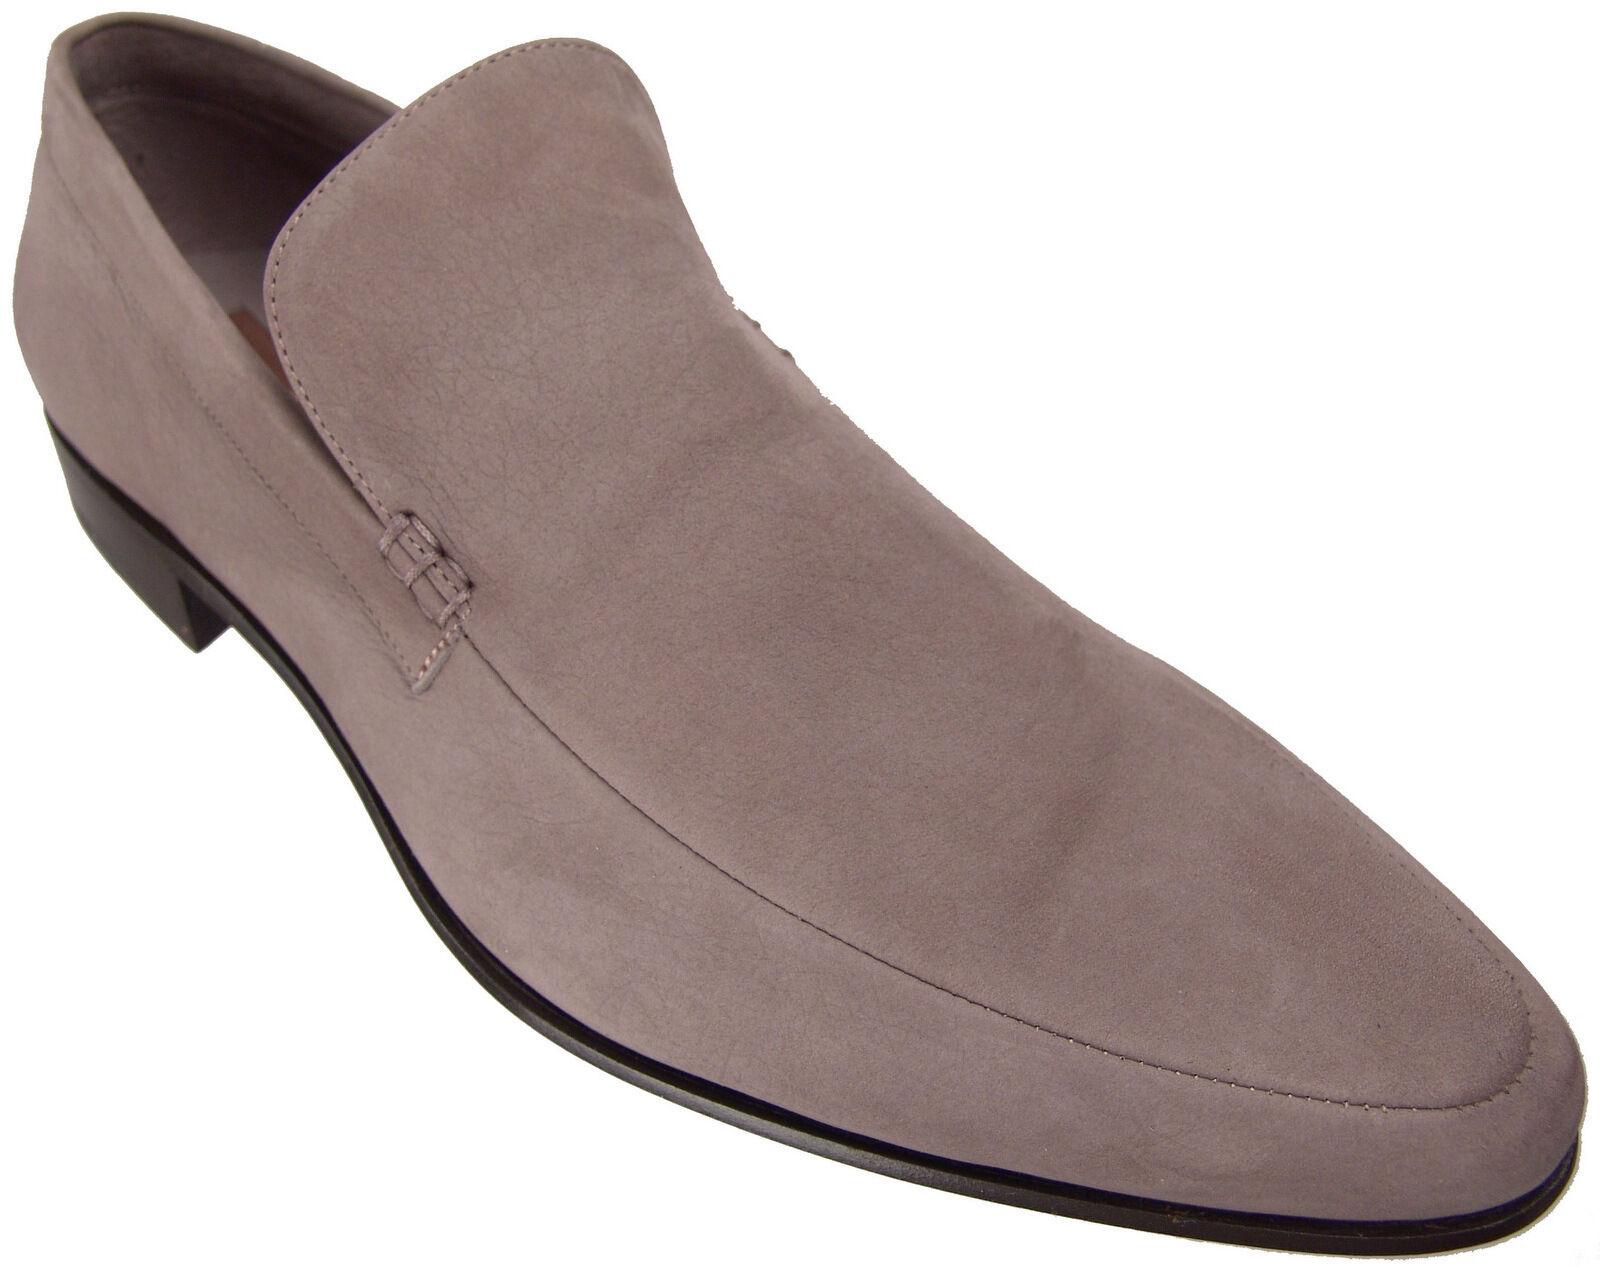 Authentic  680 Cesare Cesare Cesare Paciotti US 11 Elegant Loafers Italian Designer schuhe 8bc247